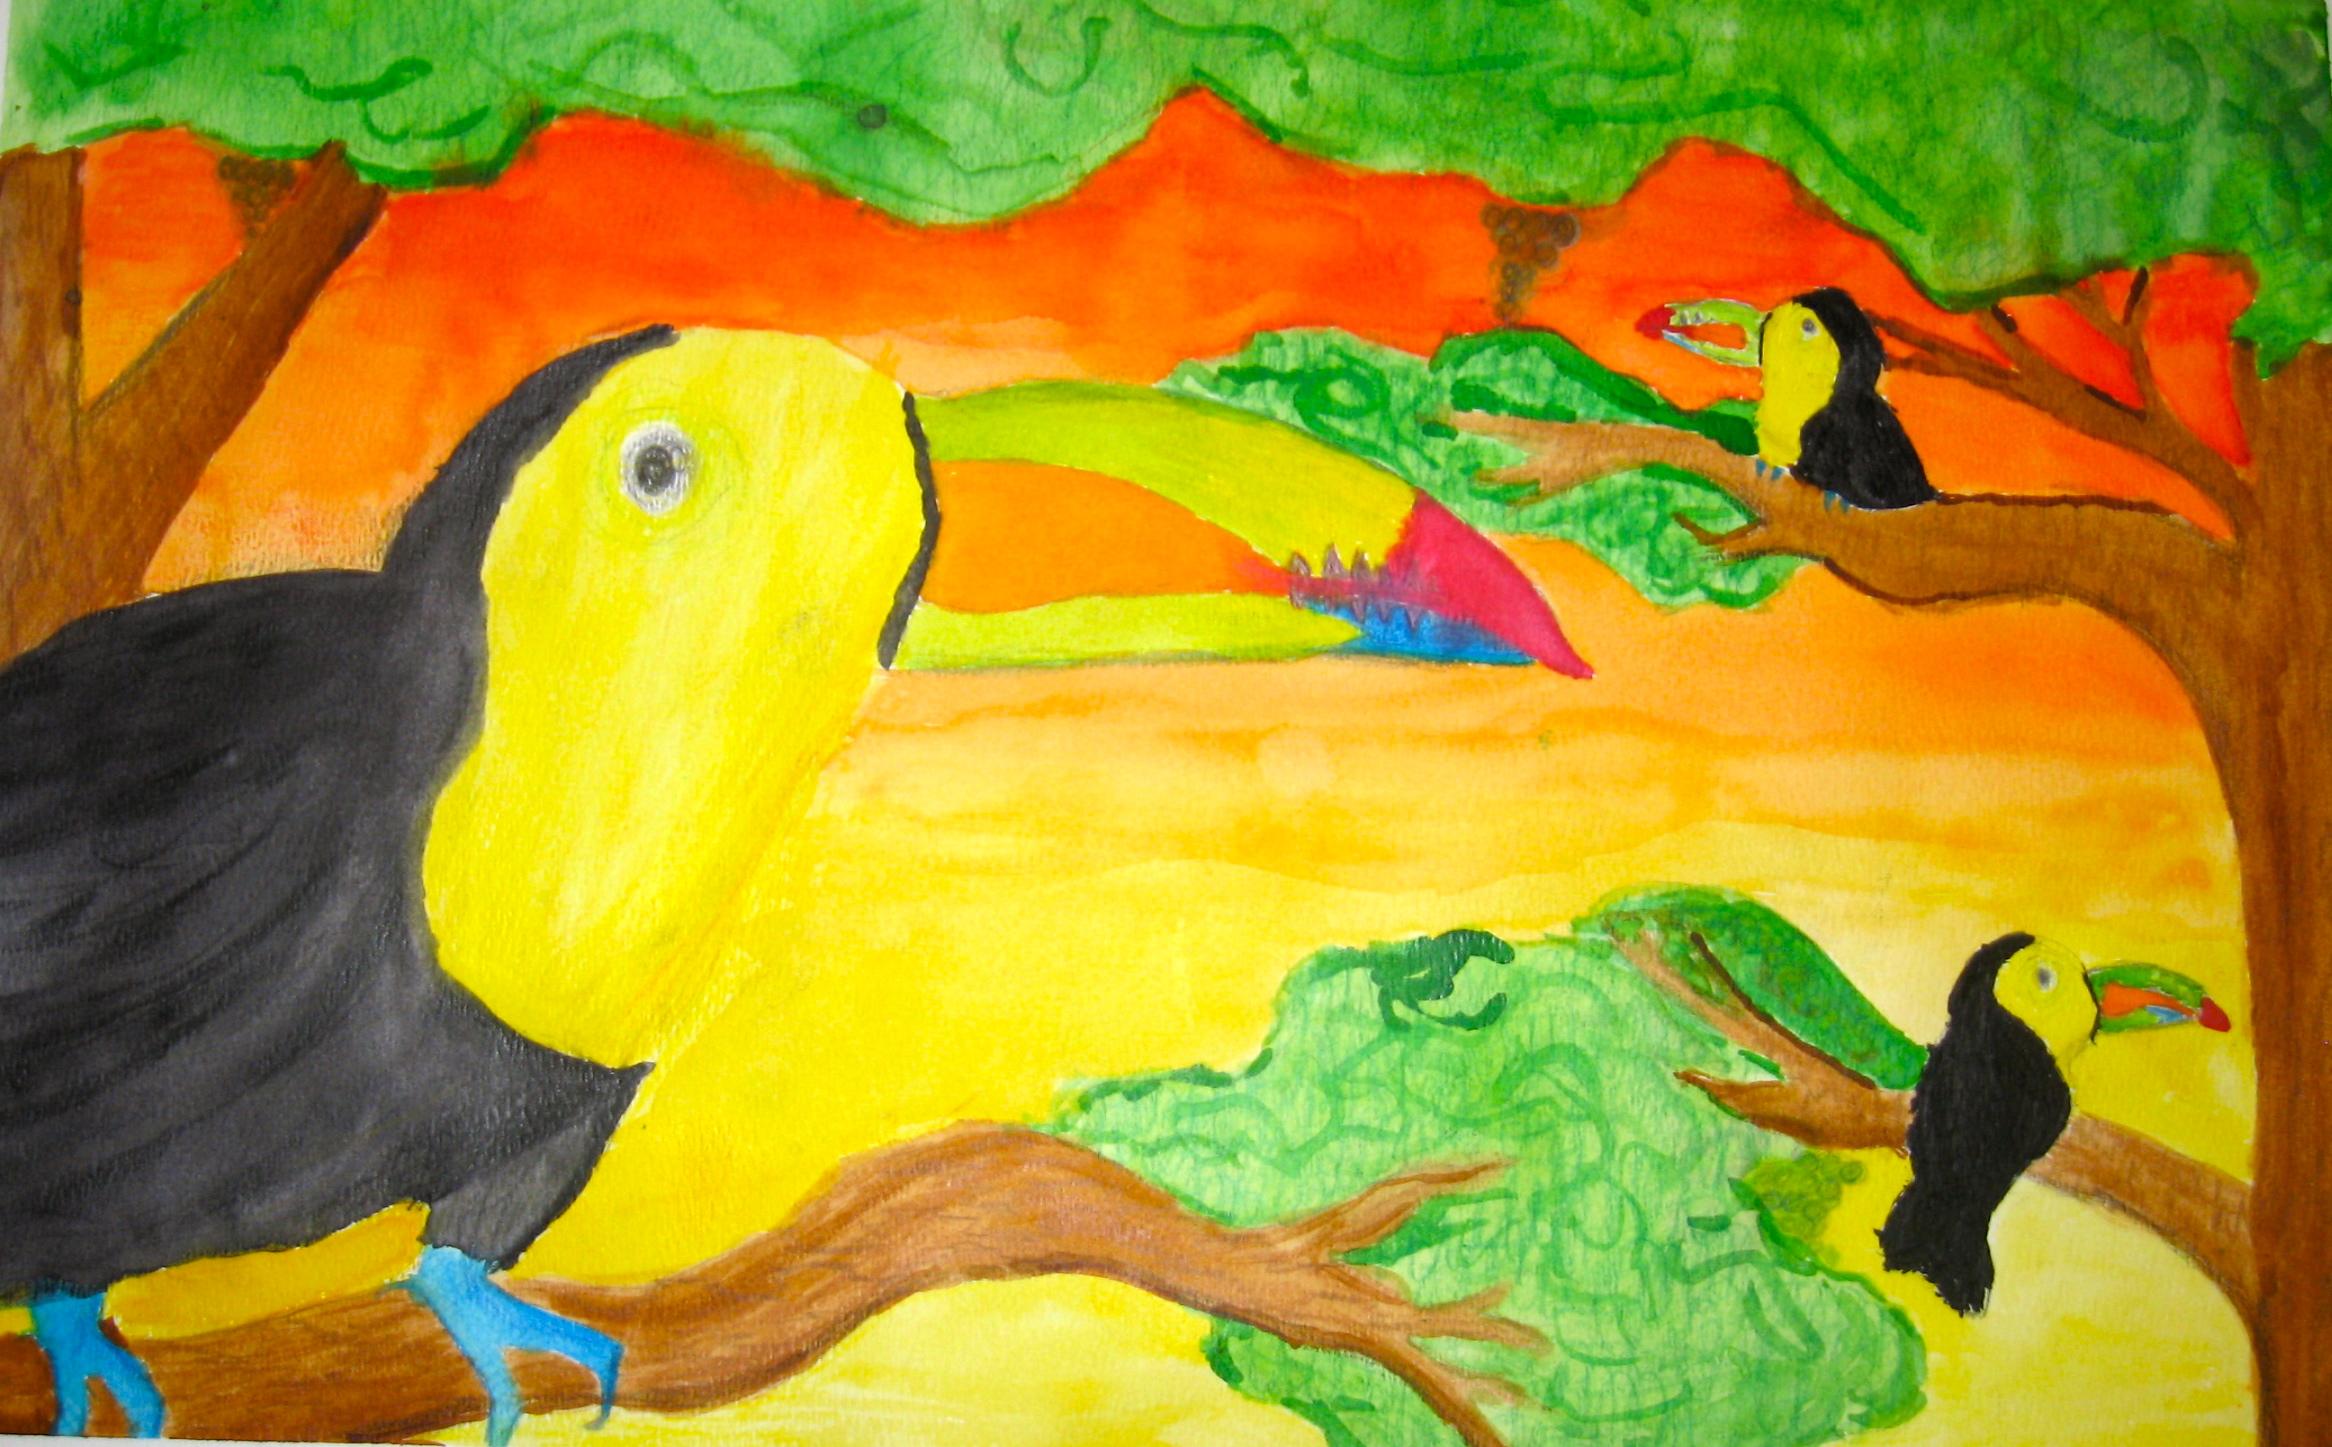 Drawn brds tropical bird Bird watercolor a for or